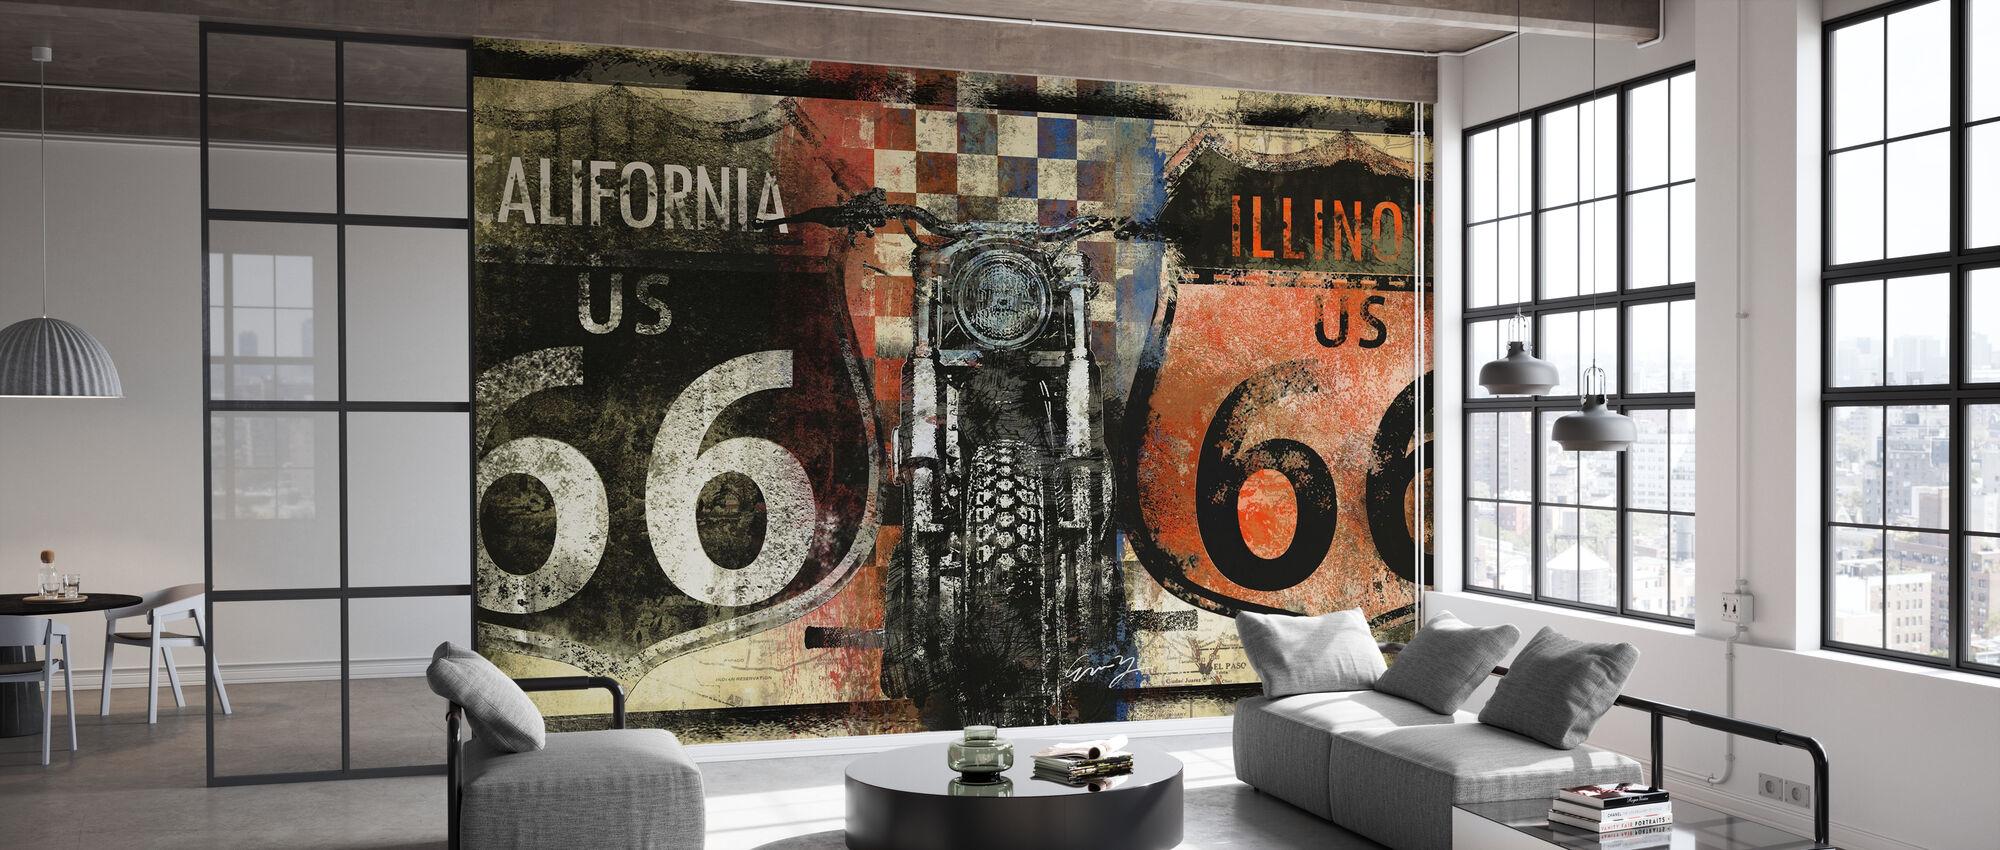 Route 66 California - Wallpaper - Office